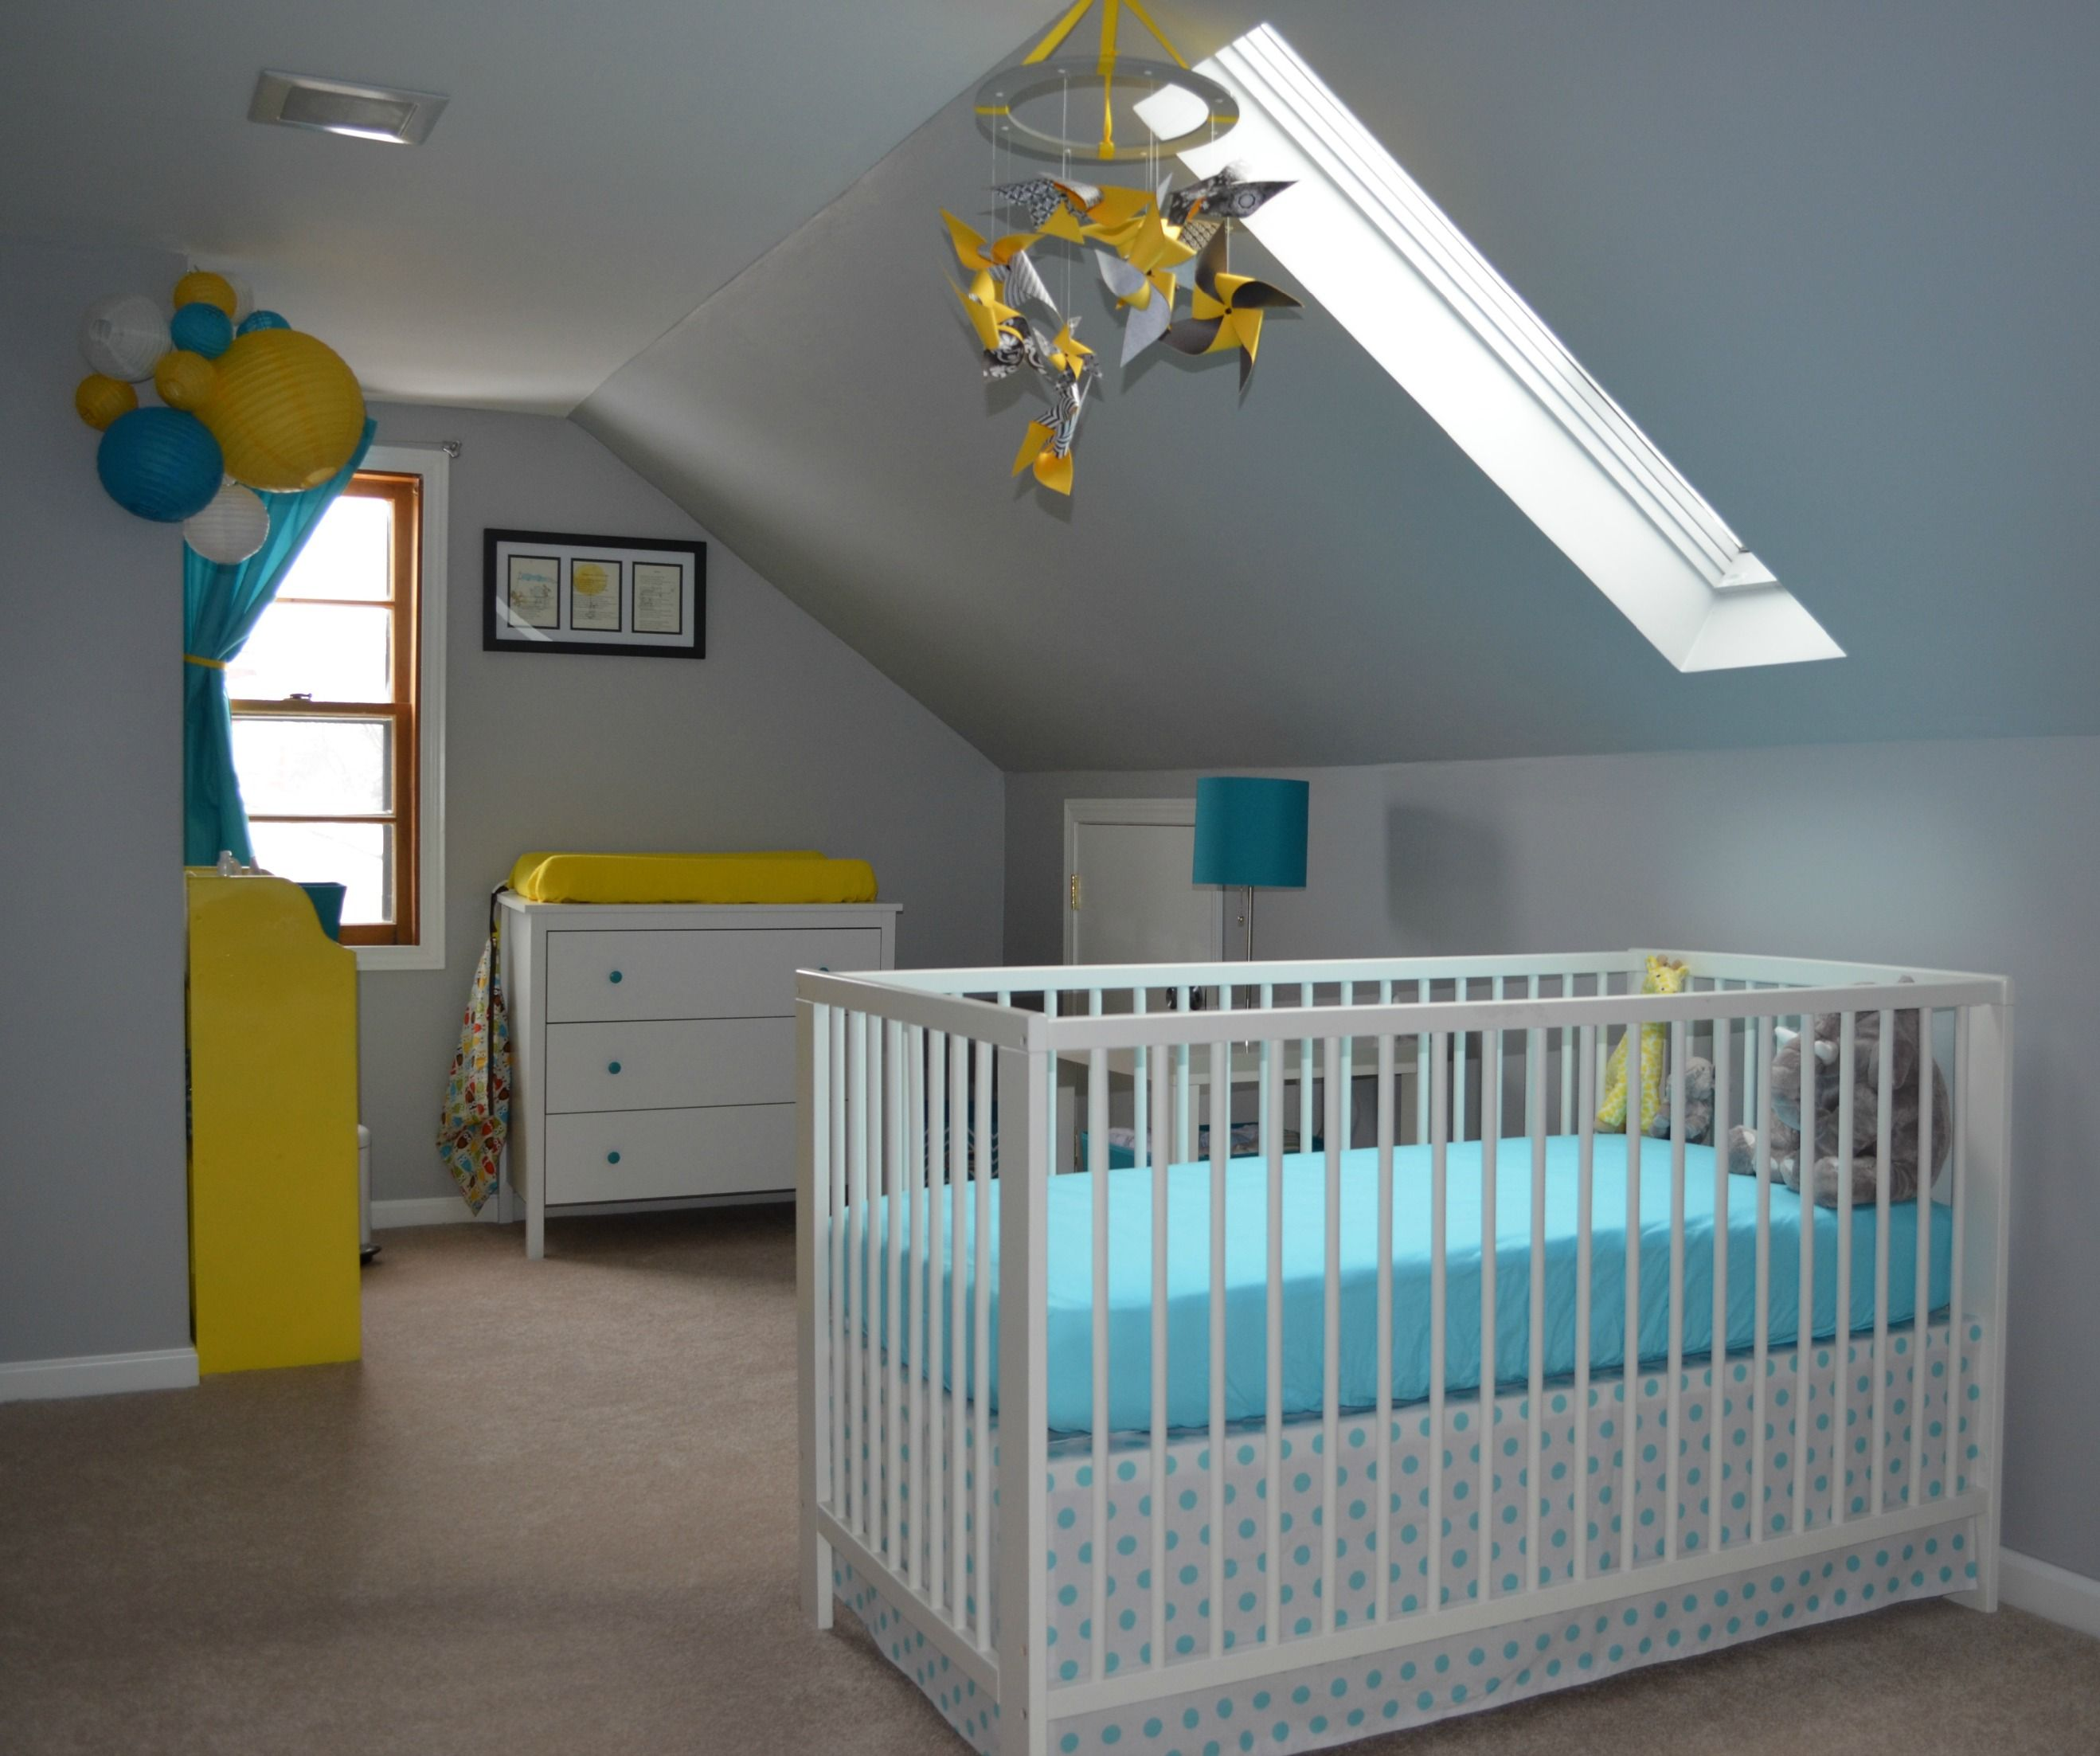 Baby Boy S Yellow Grey And Teal Attic Nursery Baby Boy Nursery Room Design Nursery Room Design Nursery Room Boy